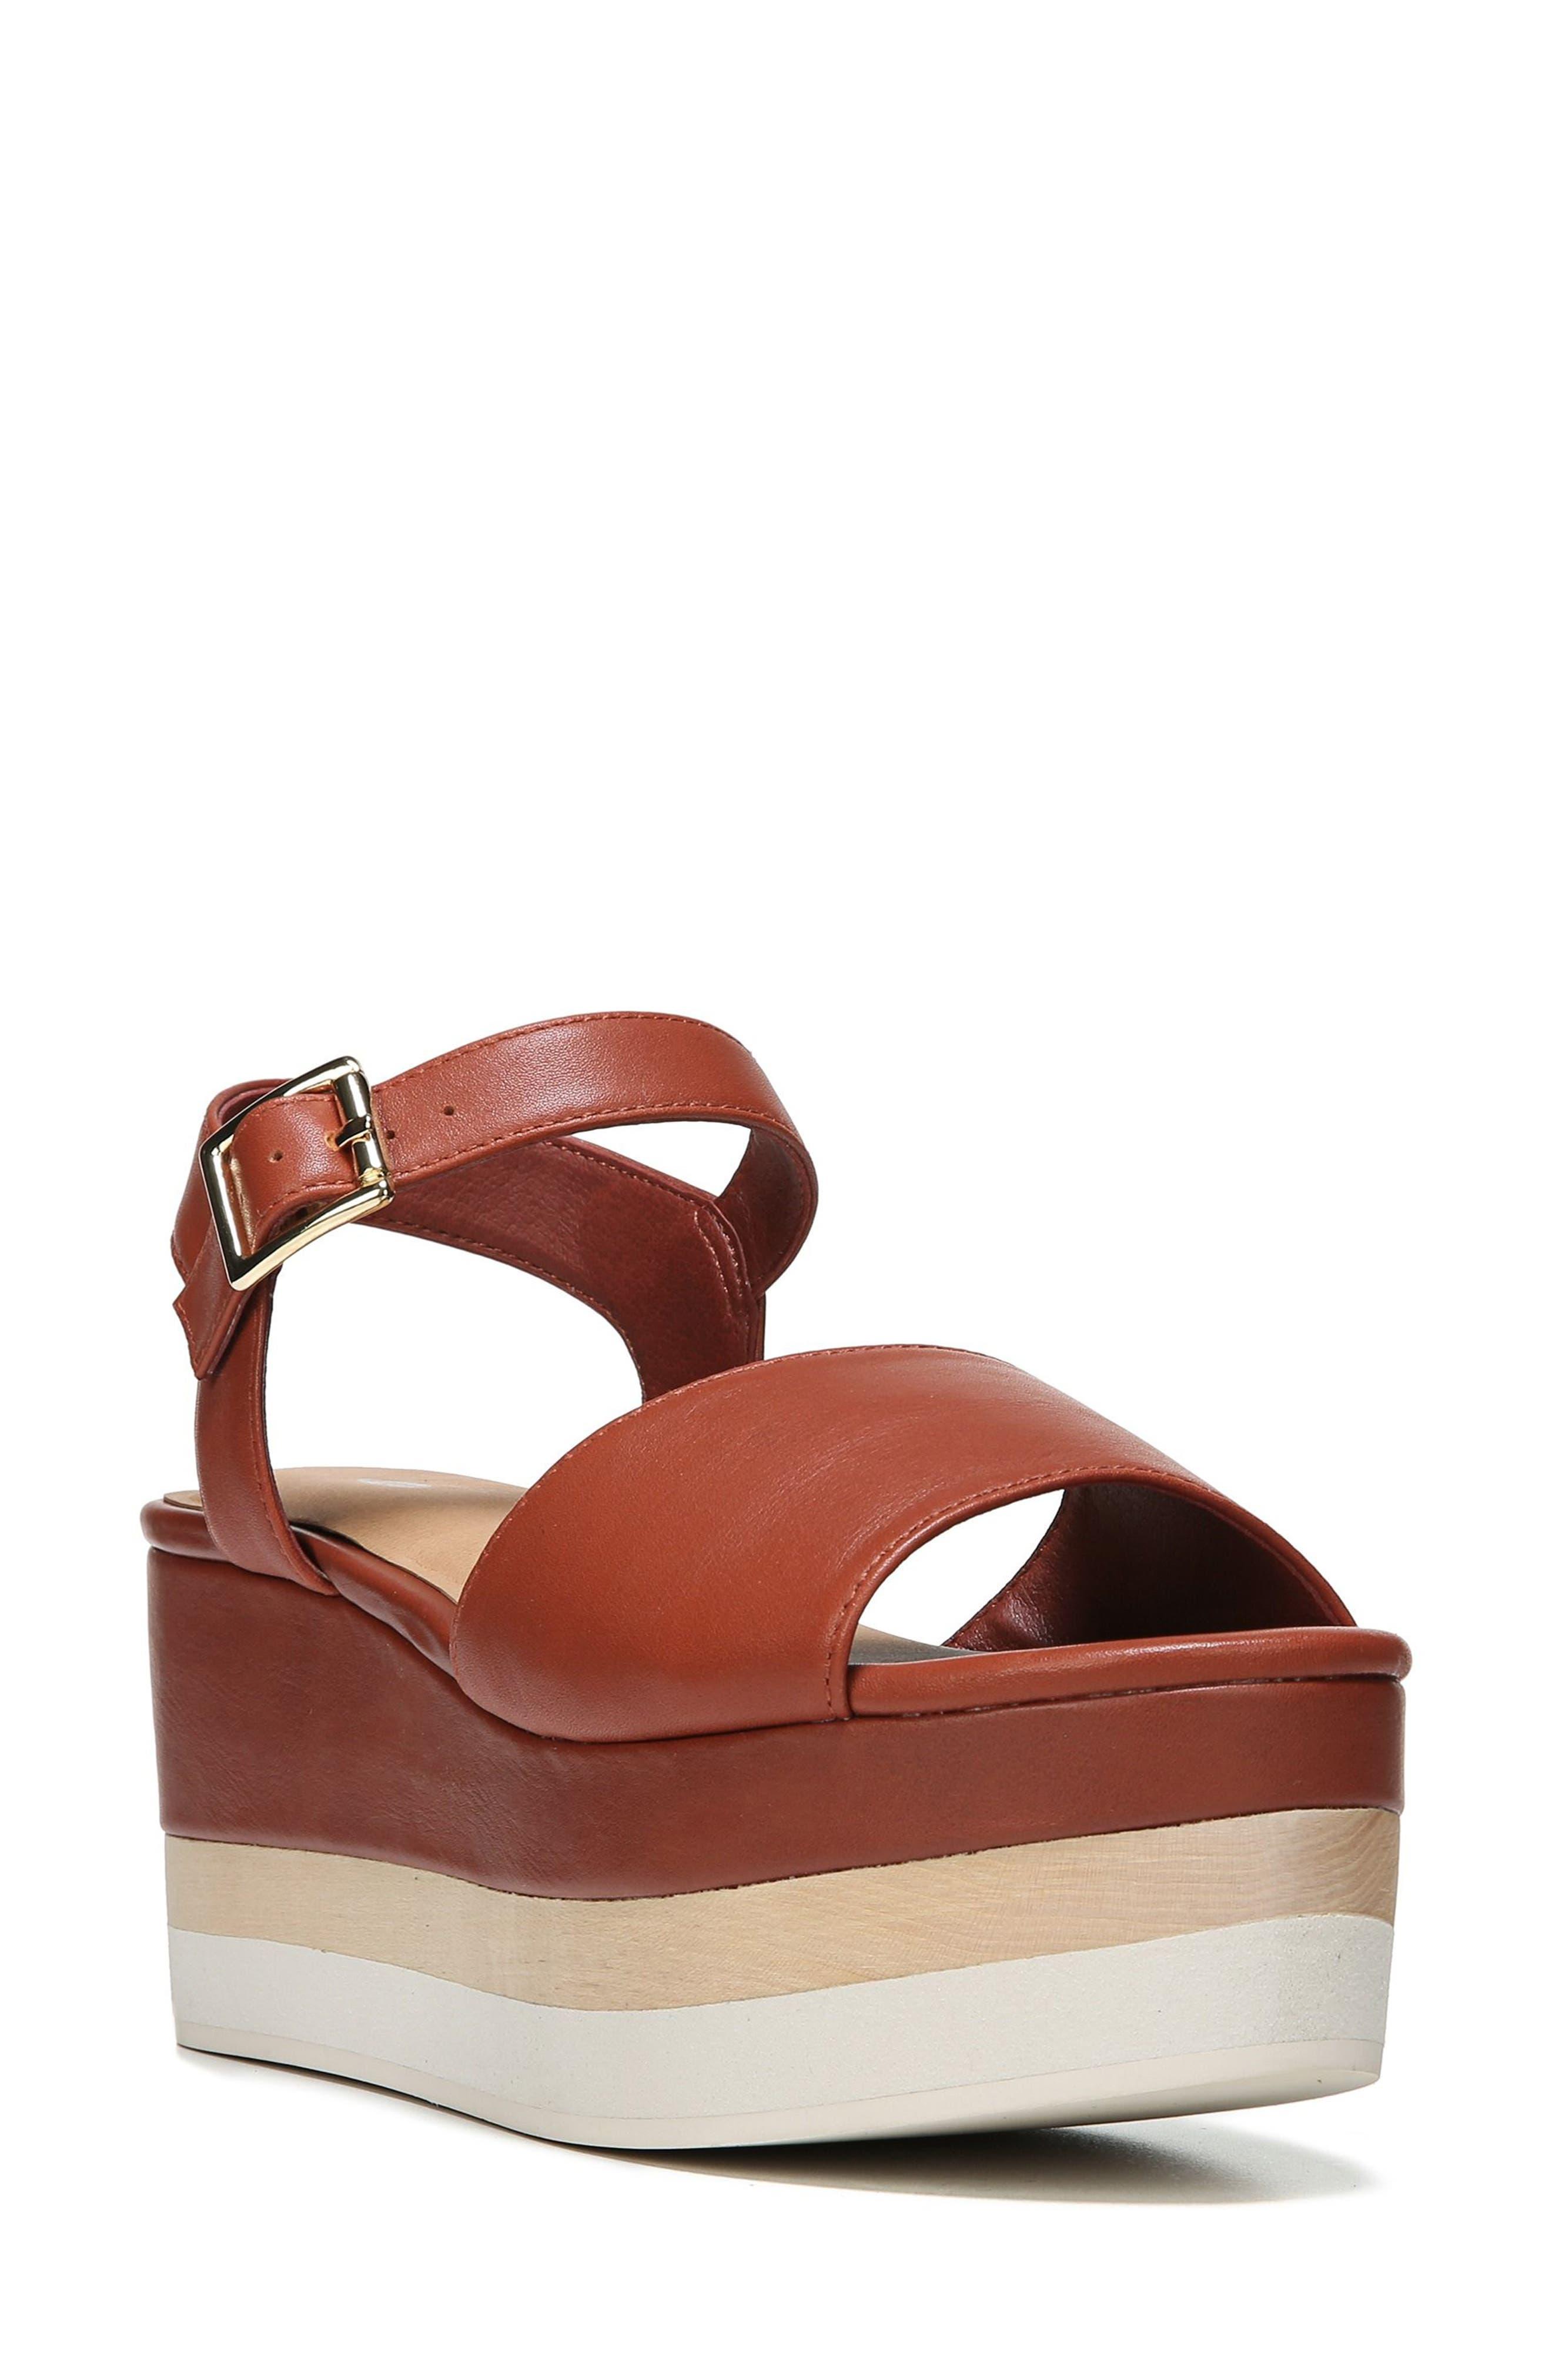 DR. SCHOLLS Corinne Layered Platform Sandal